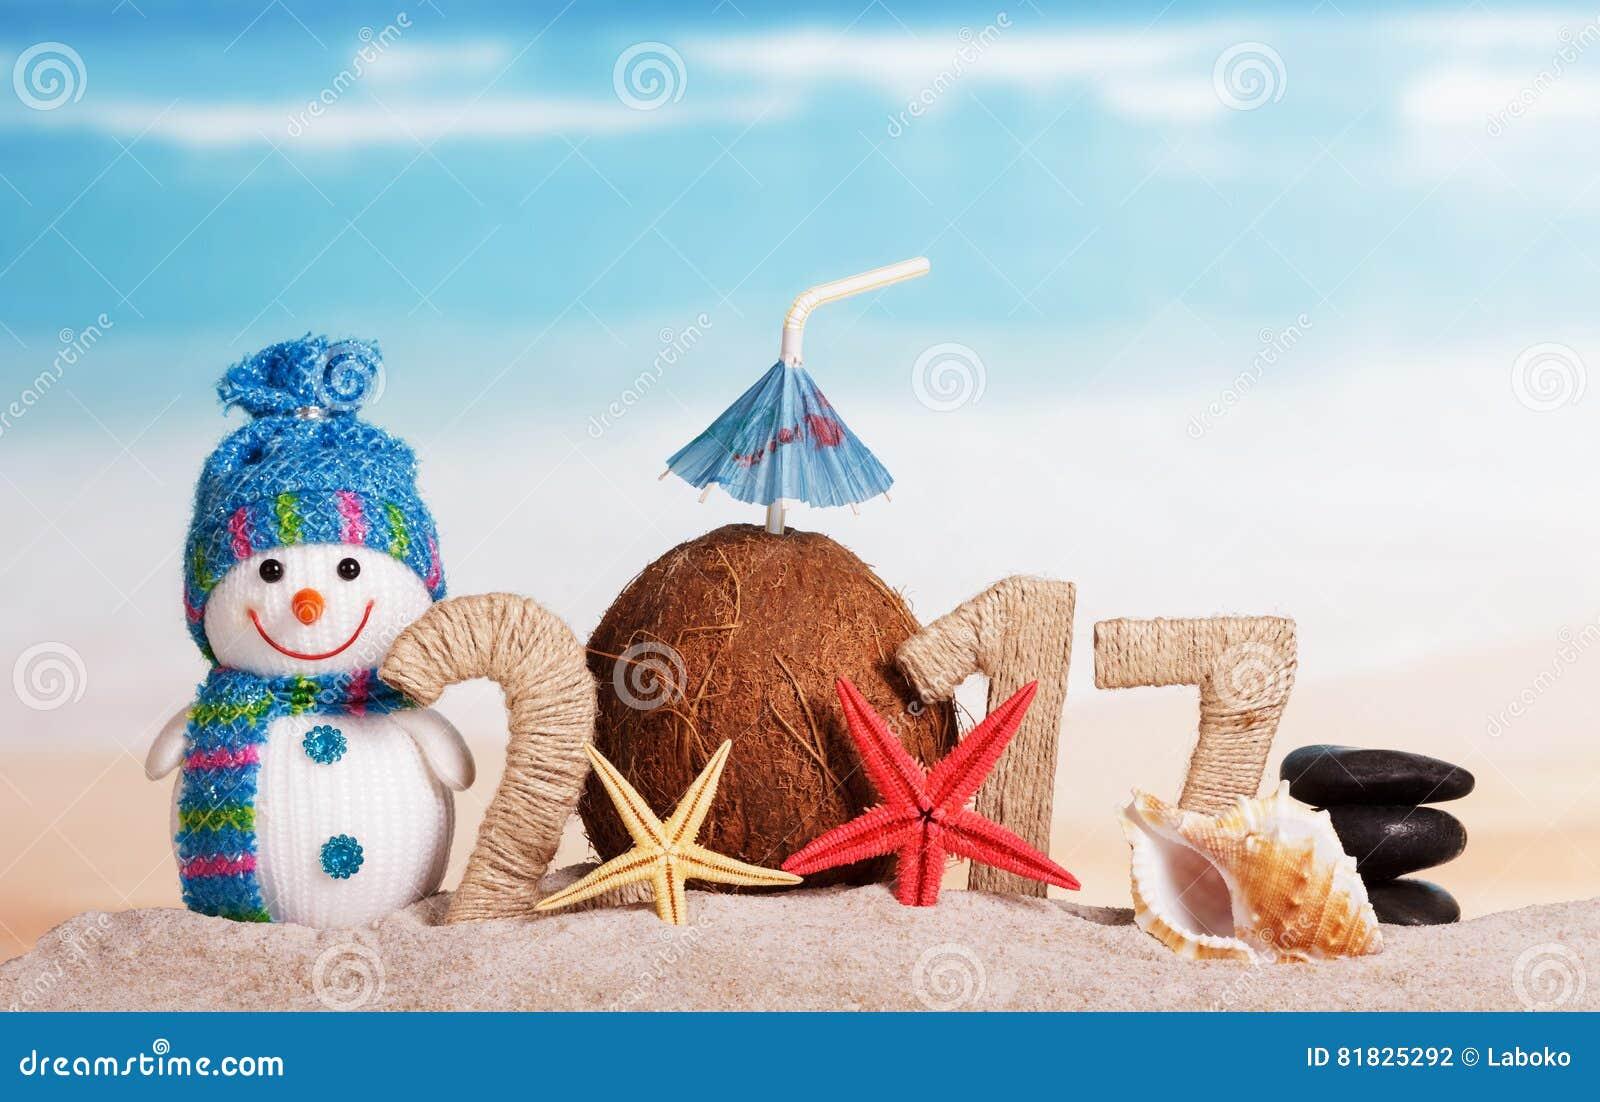 Christmas beach with the inscription snowman and